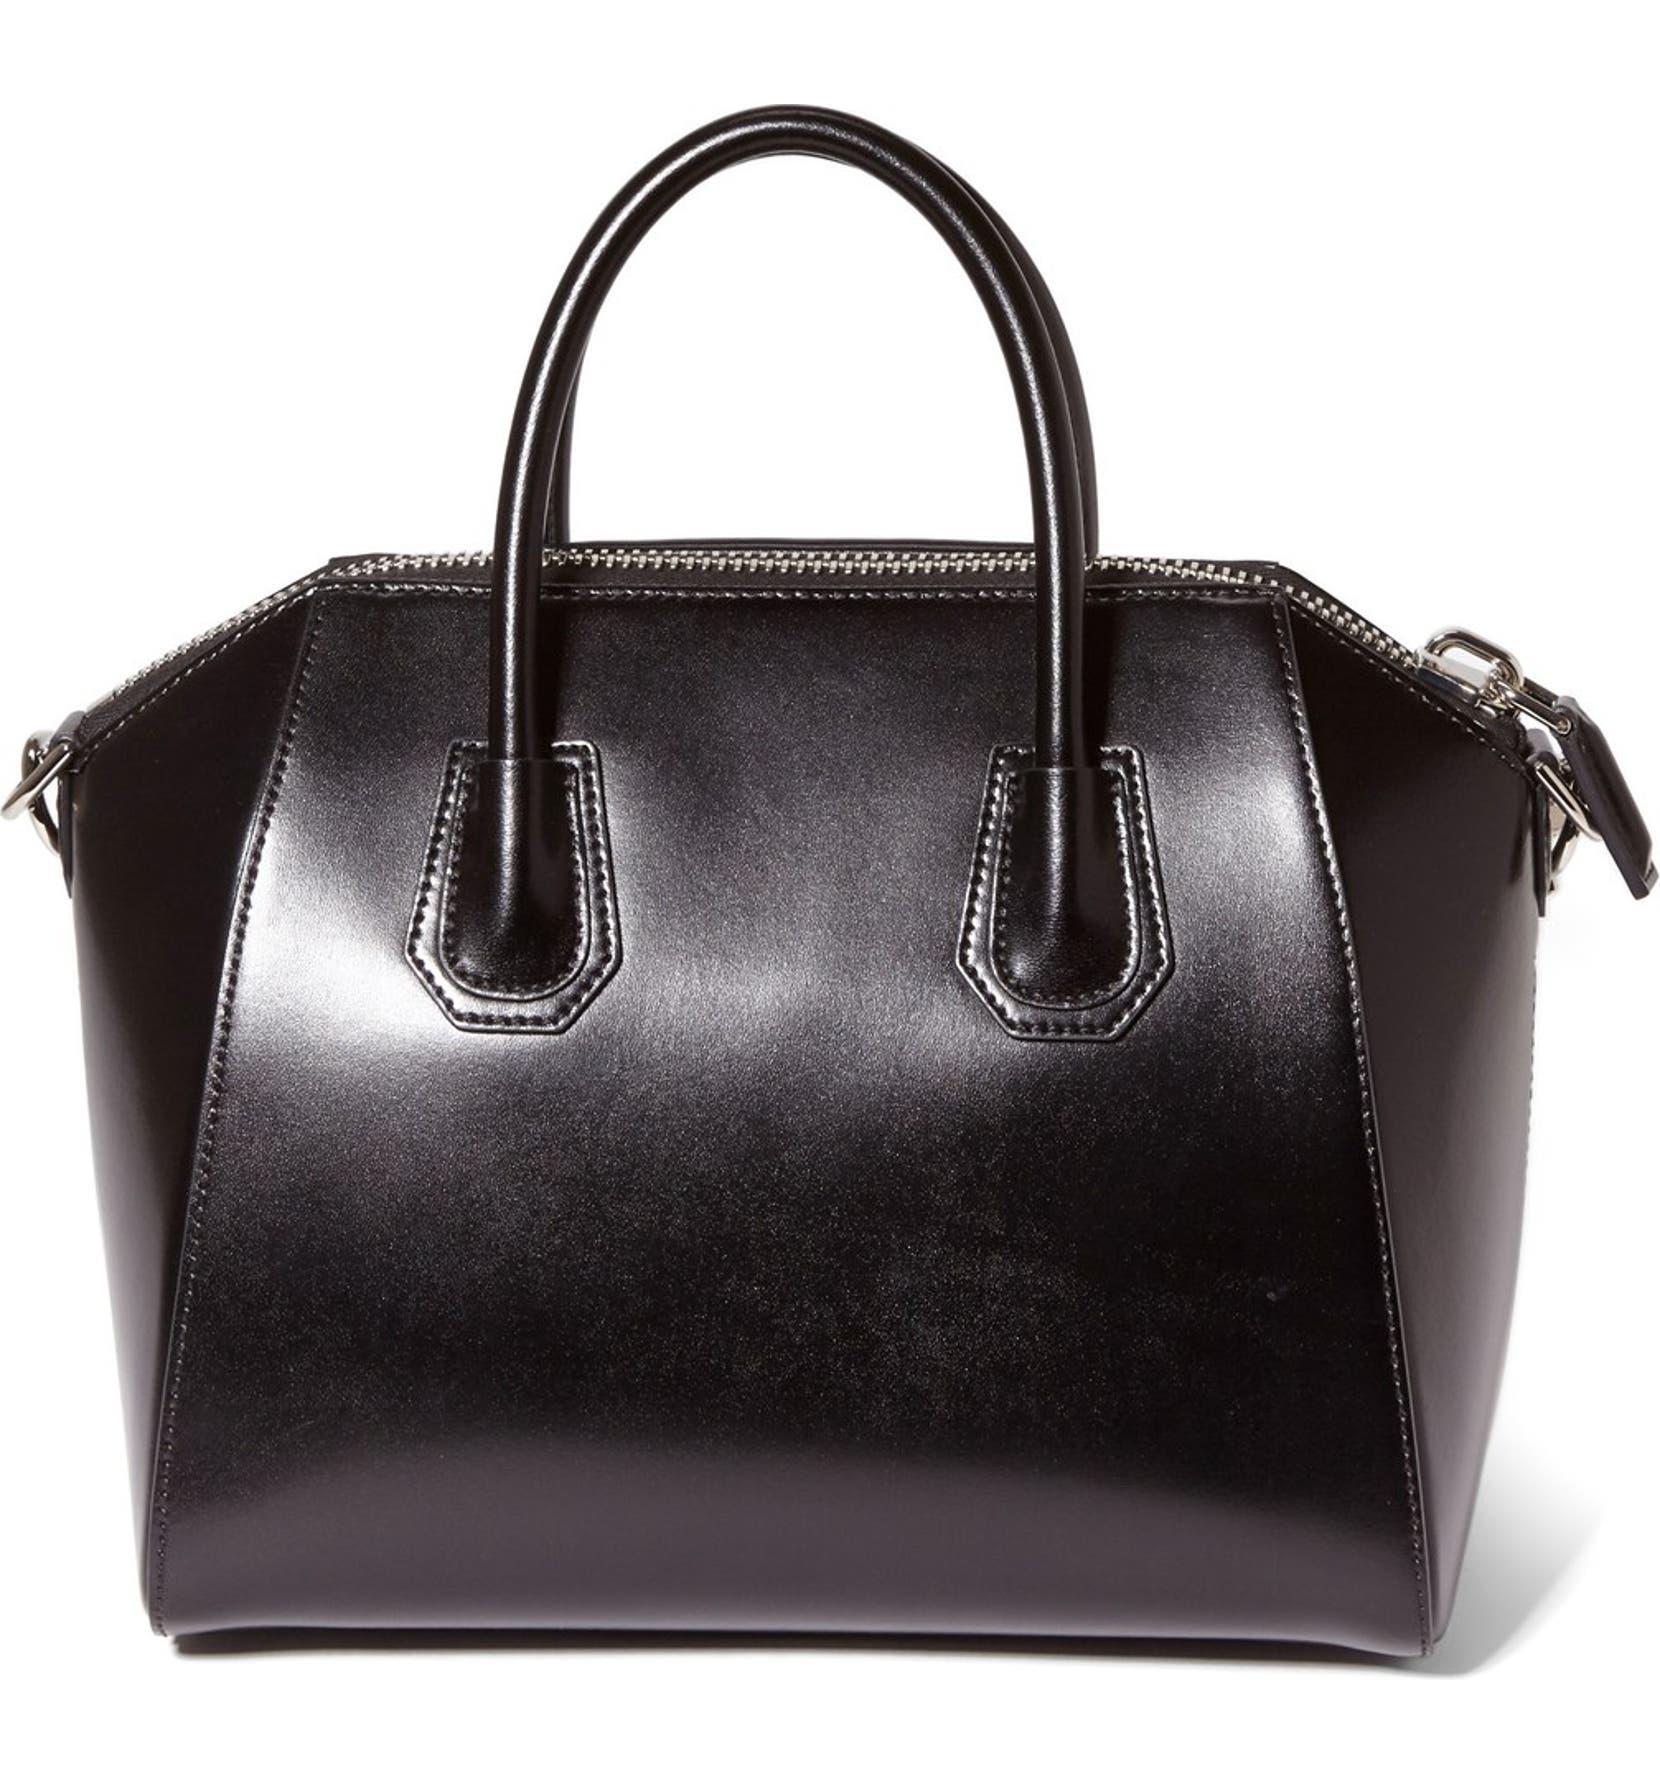 2336bdc93f Givenchy 'Antigona' Calfskin Leather Satchel   Nordstrom